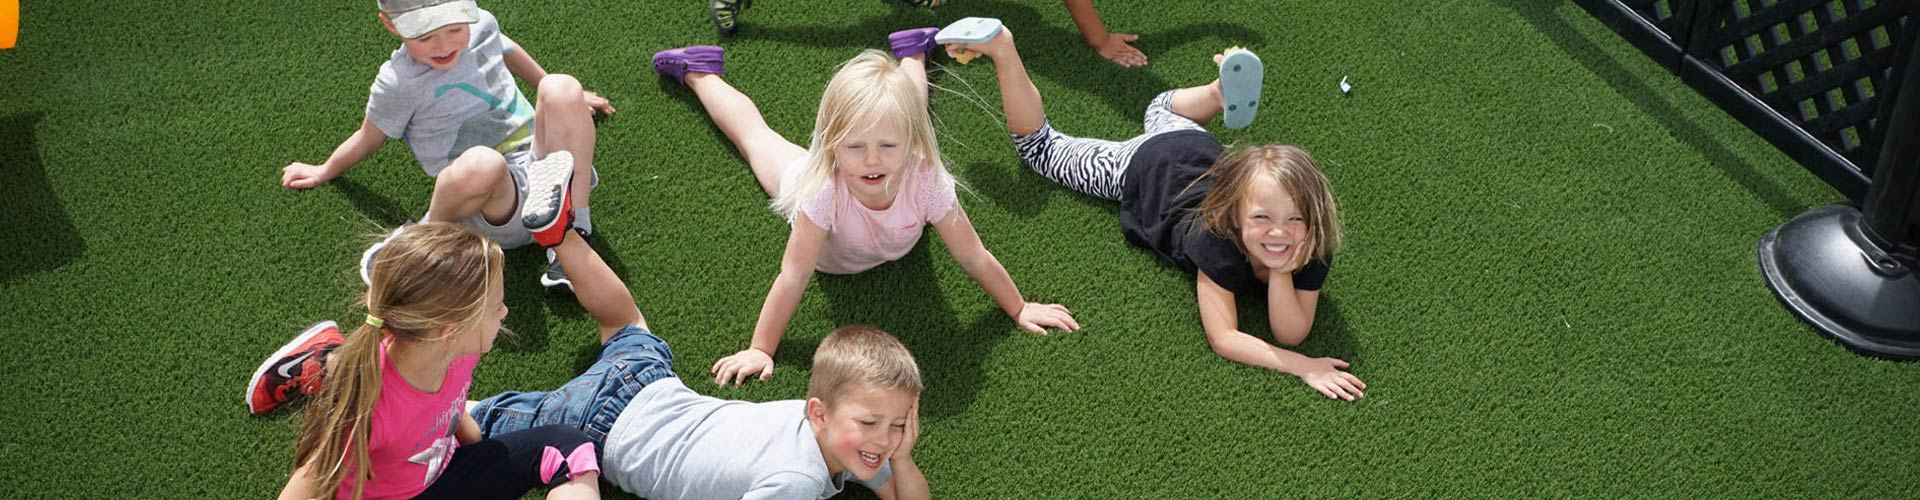 Synthetic playground turf in Georgia